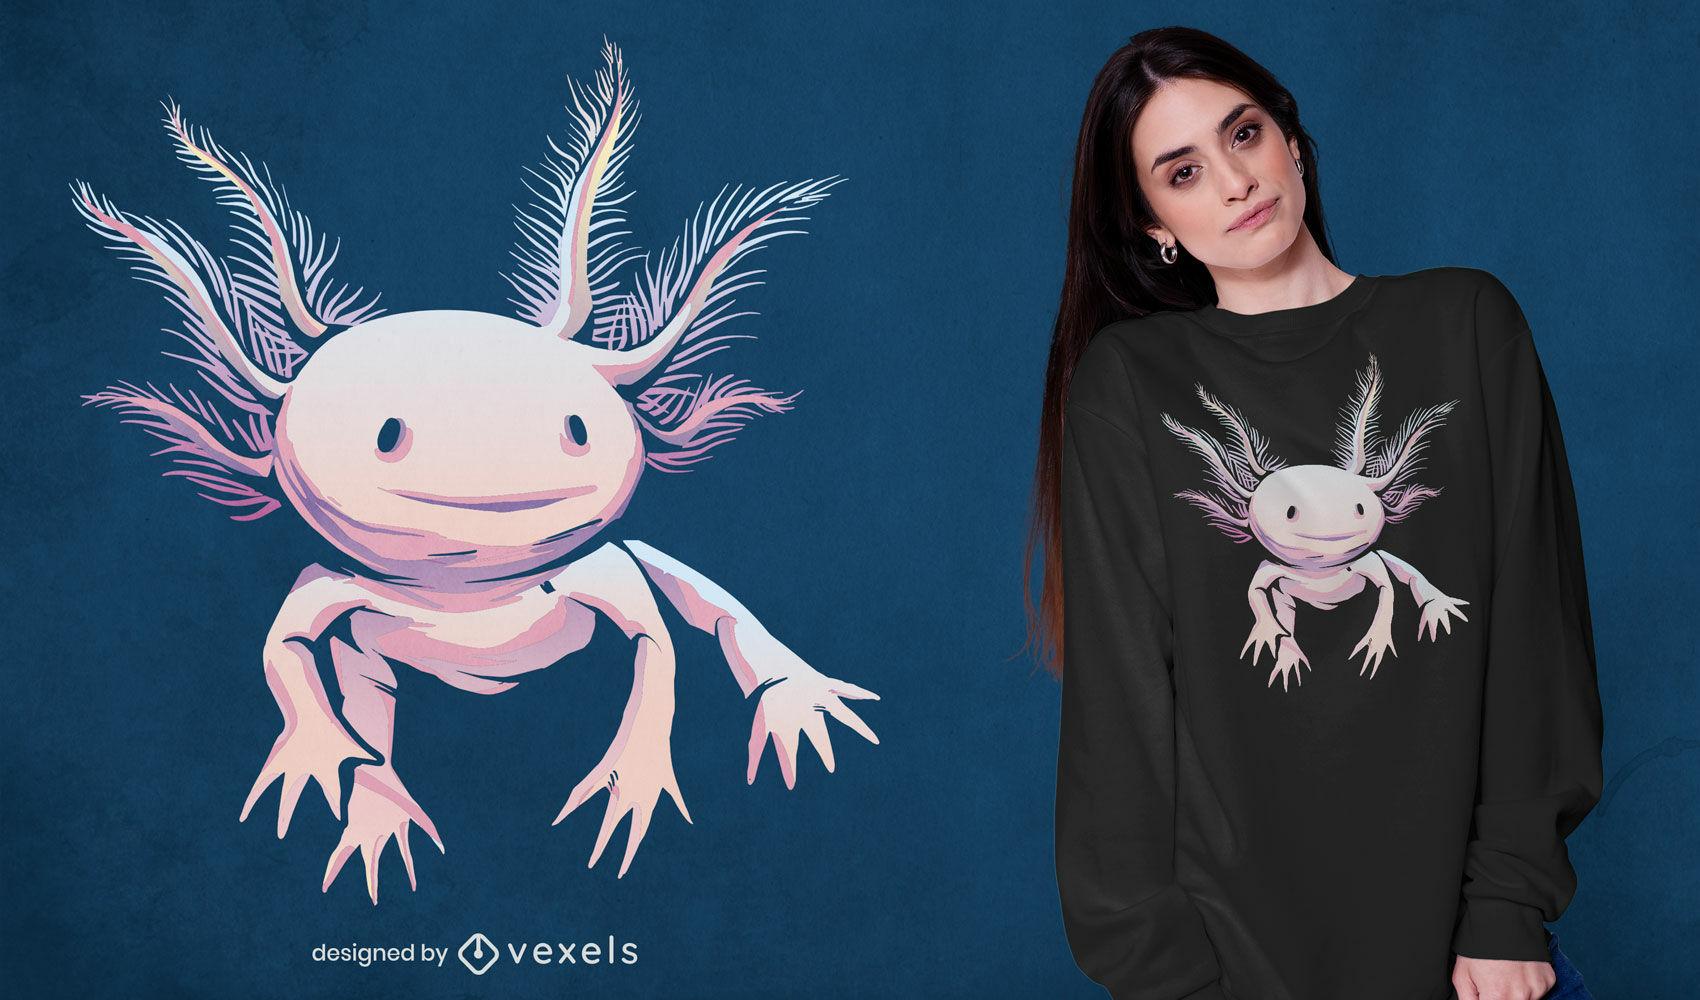 Realistisches Axolotl-Tier-T-Shirt-Design